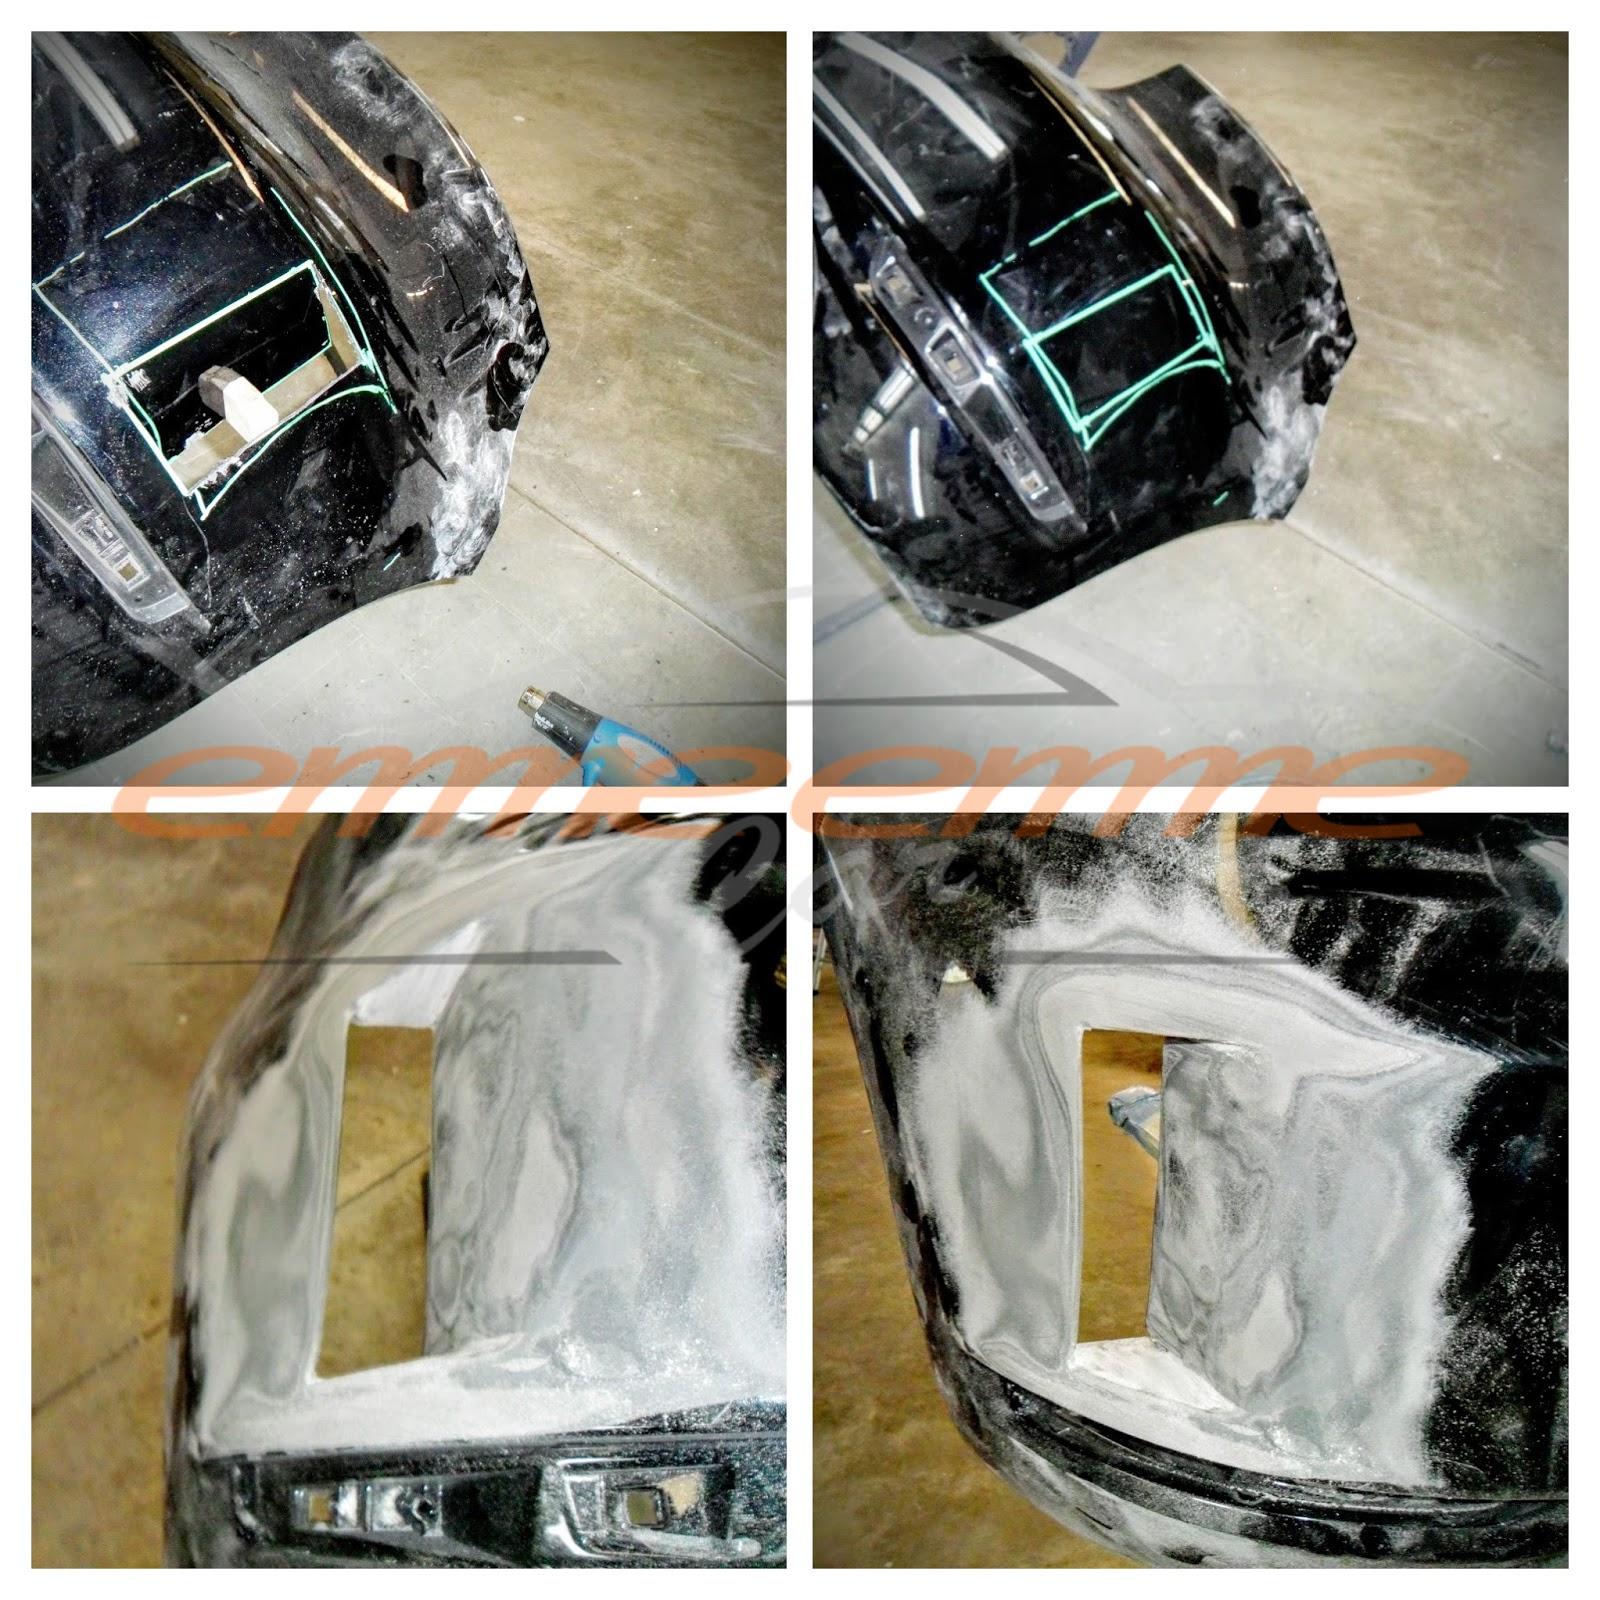 Modifica artigianale del paraurti posteriore - Emmeemme Car